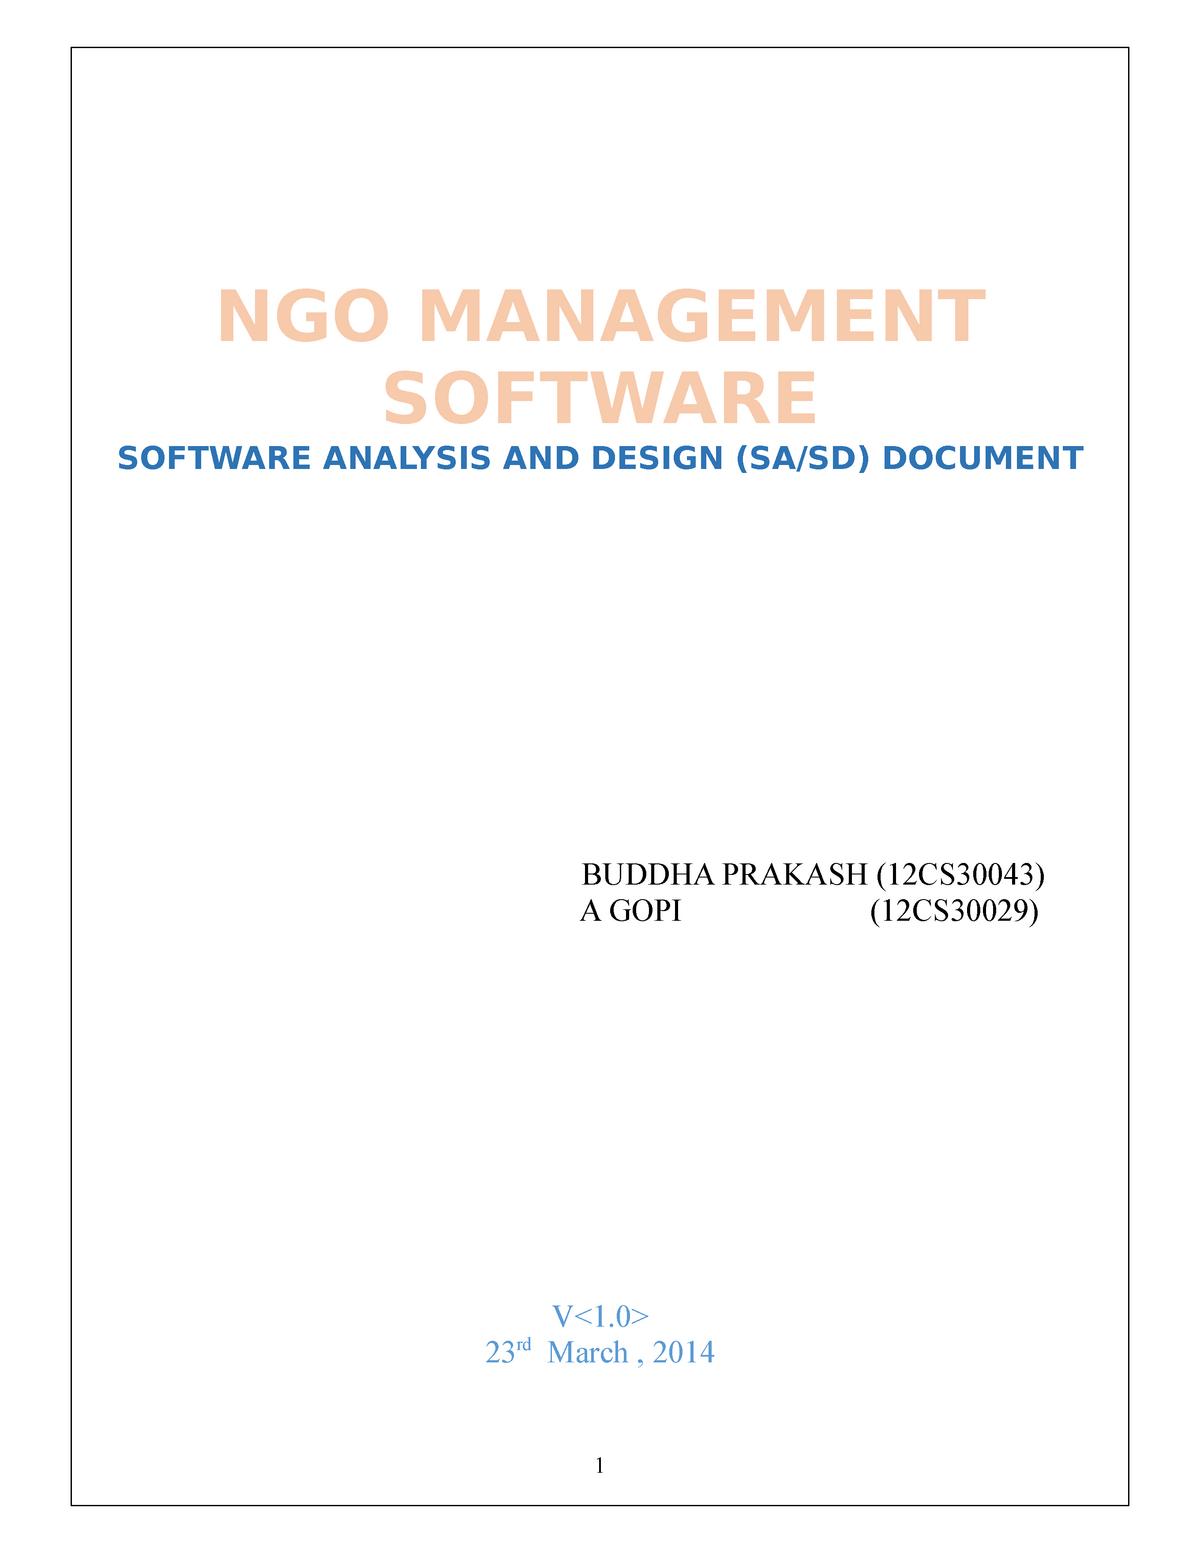 Ngo Management System Csc141 Cui Ngo Management Software Software Analysis And Design Sa Sd Document Buddha Prakash 12cs30043 Gopi 12cs30029 Lt Gt 23 March Studocu